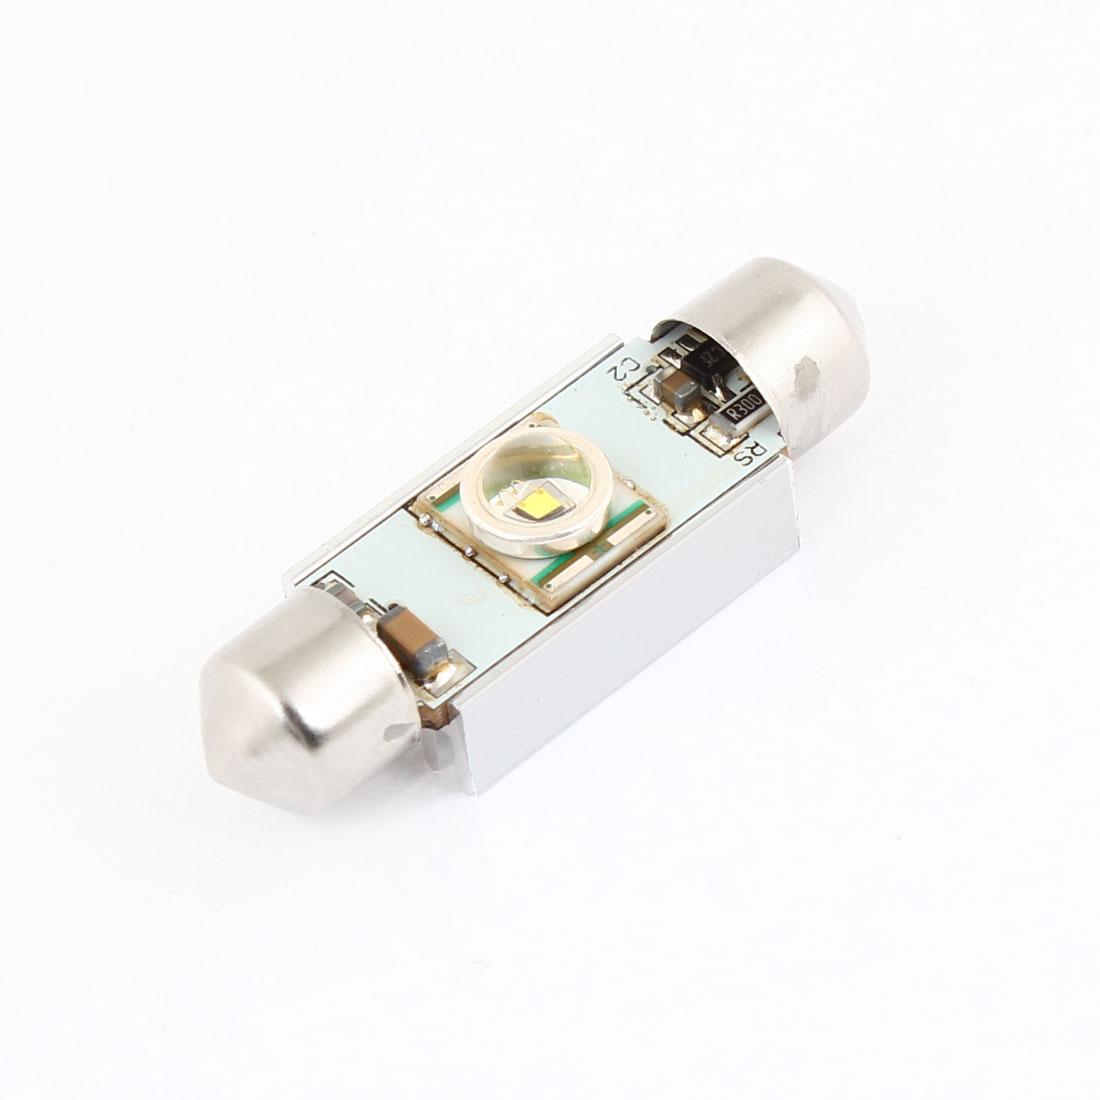 39mm Canbus White LED Heat Sink Festoon Light 7W for Car Interior Dome Lamp